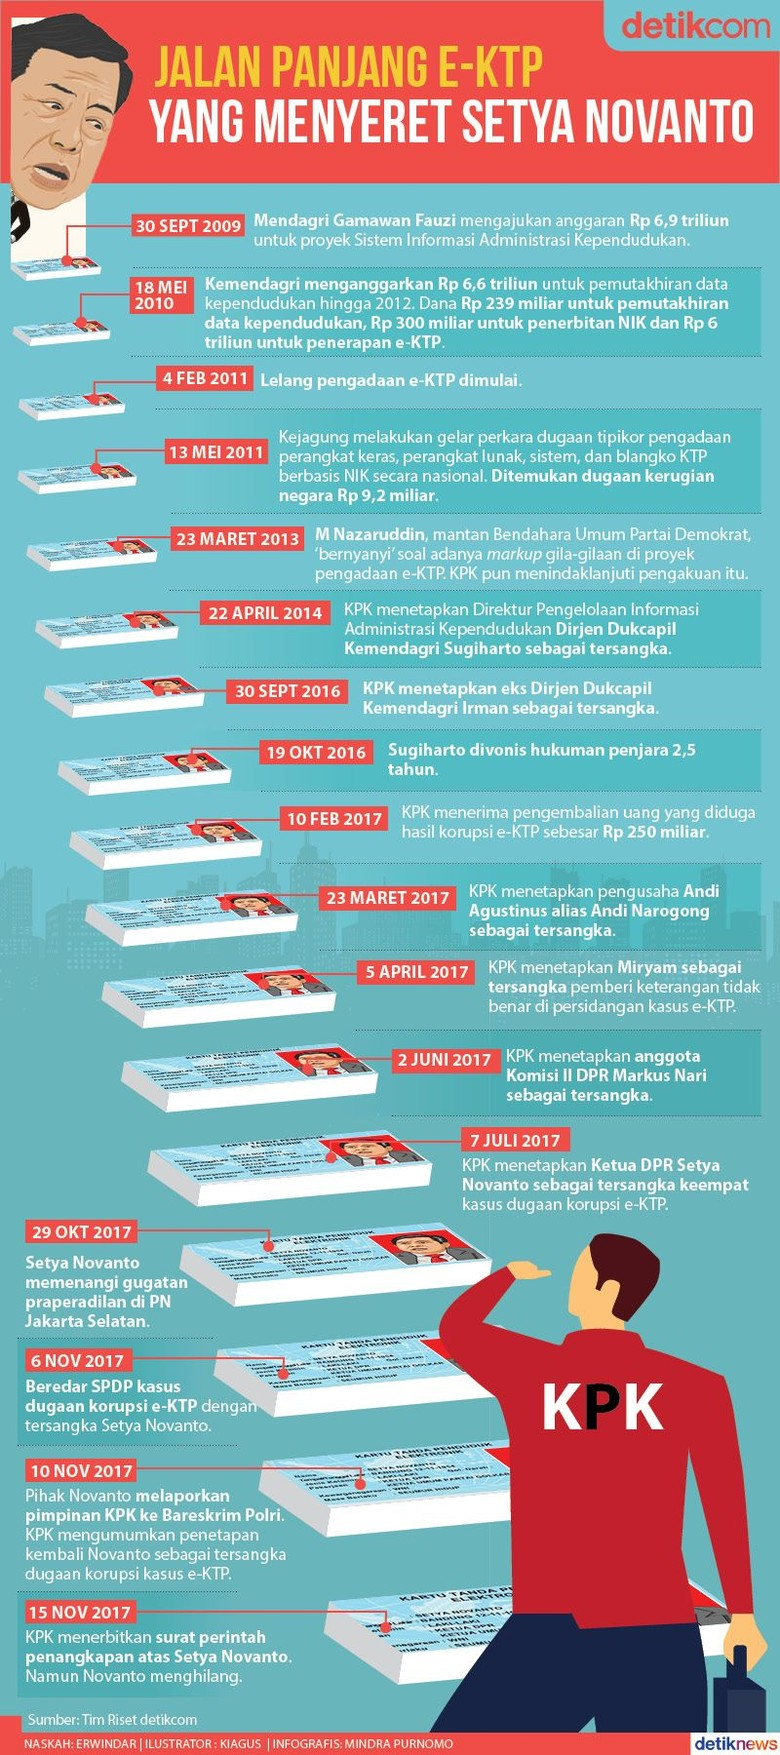 Jalan Panjang Kasus e-KTP yang Menyeret Setya Novanto